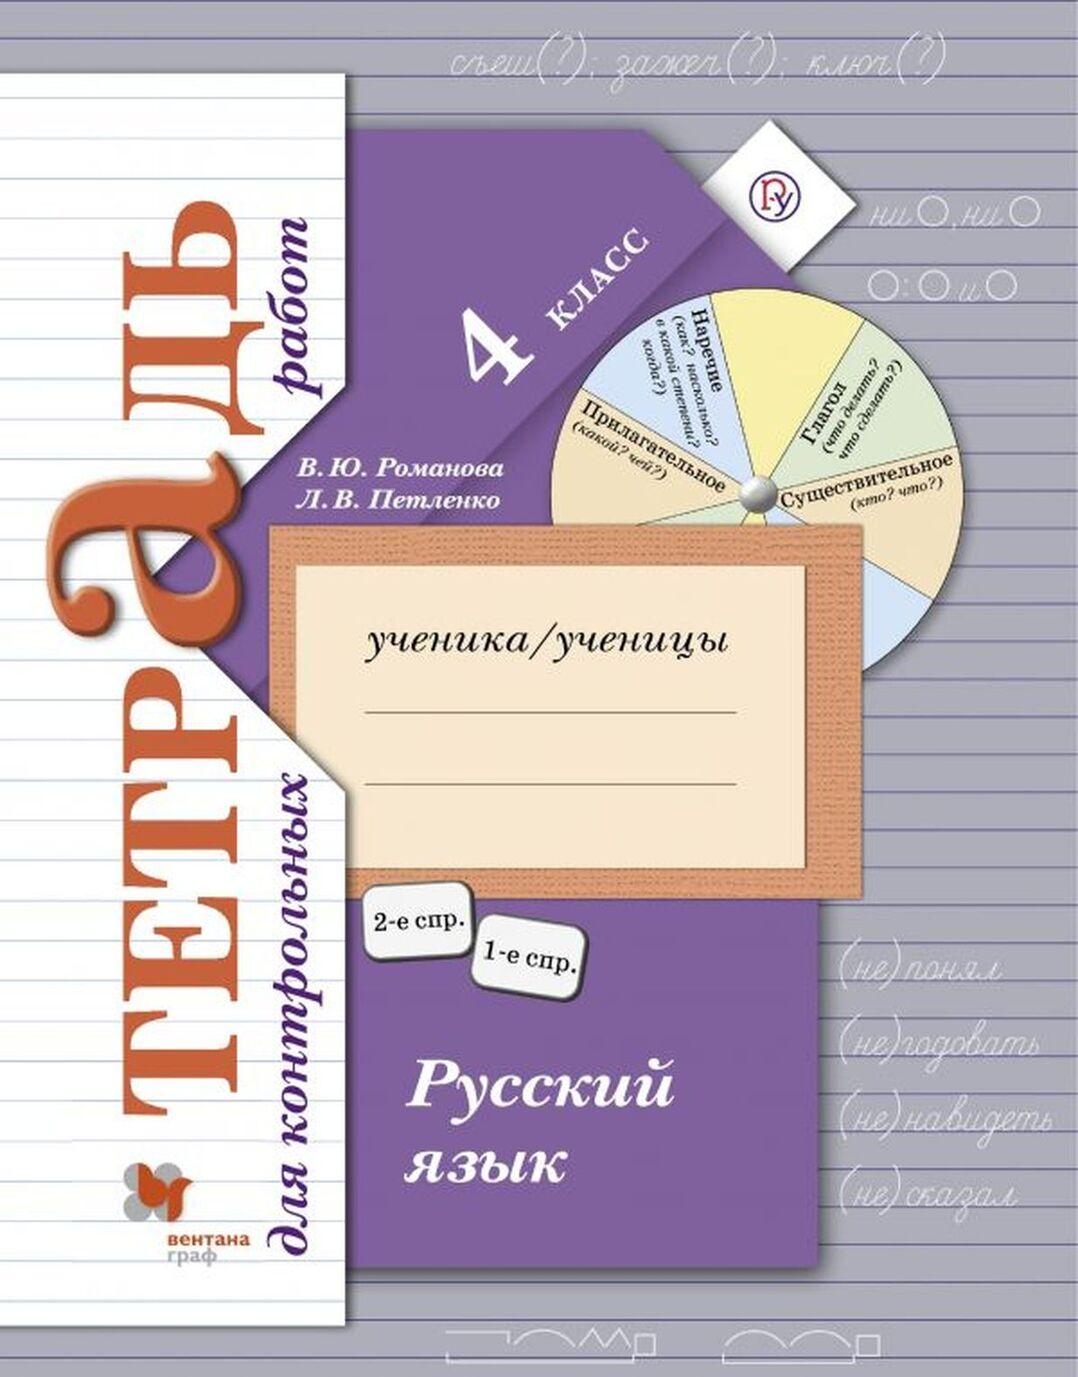 Russkij jazyk. 4 klass. Tetrad dlja kontrolnykh rabot | Romanova Vladislava Jurevna, Petlenko Lidija Vladimirovna